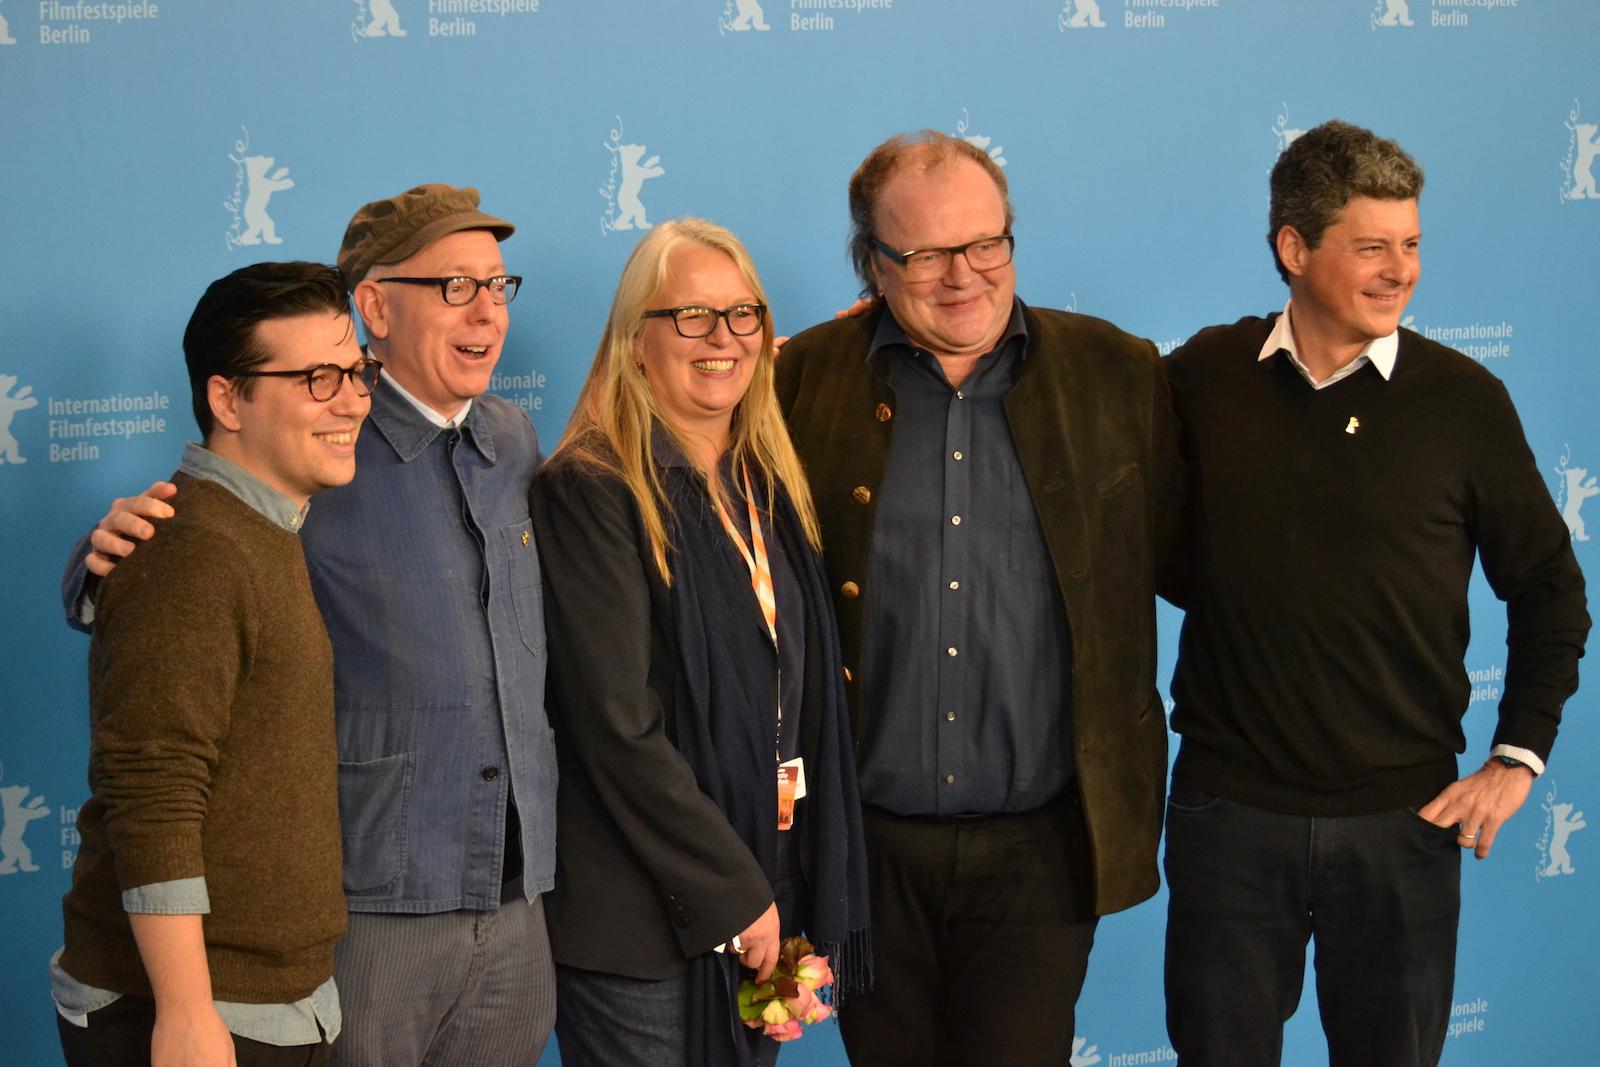 Berlino 2016: James Schamus, Sarah Gadon, Logan Lerman e i produttori del film al photocall di Indignation